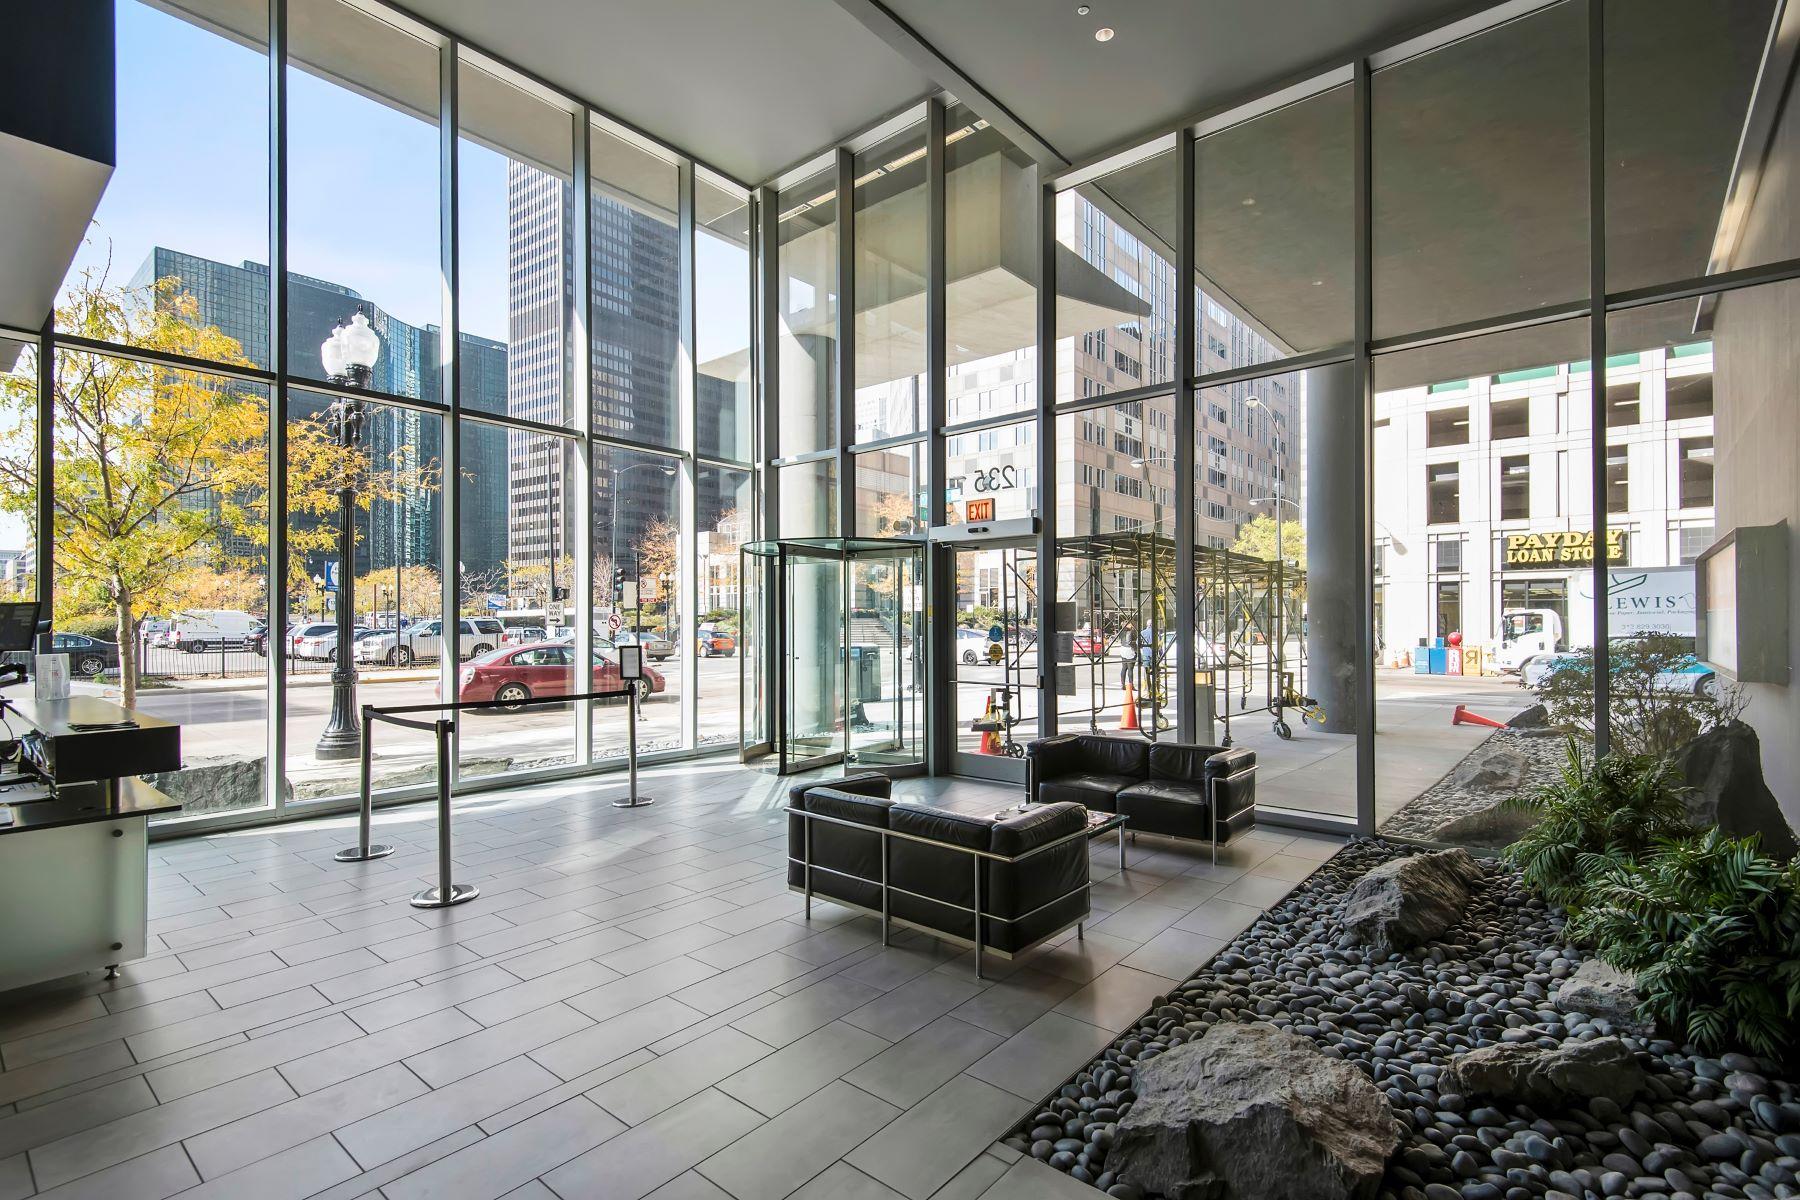 Condominium for Sale at RARELY AVAILABLE NORTH-FACING PENTHOUSE 235 W Van Buren Street Unit 4513, Loop, Chicago, Illinois, 60607 United States